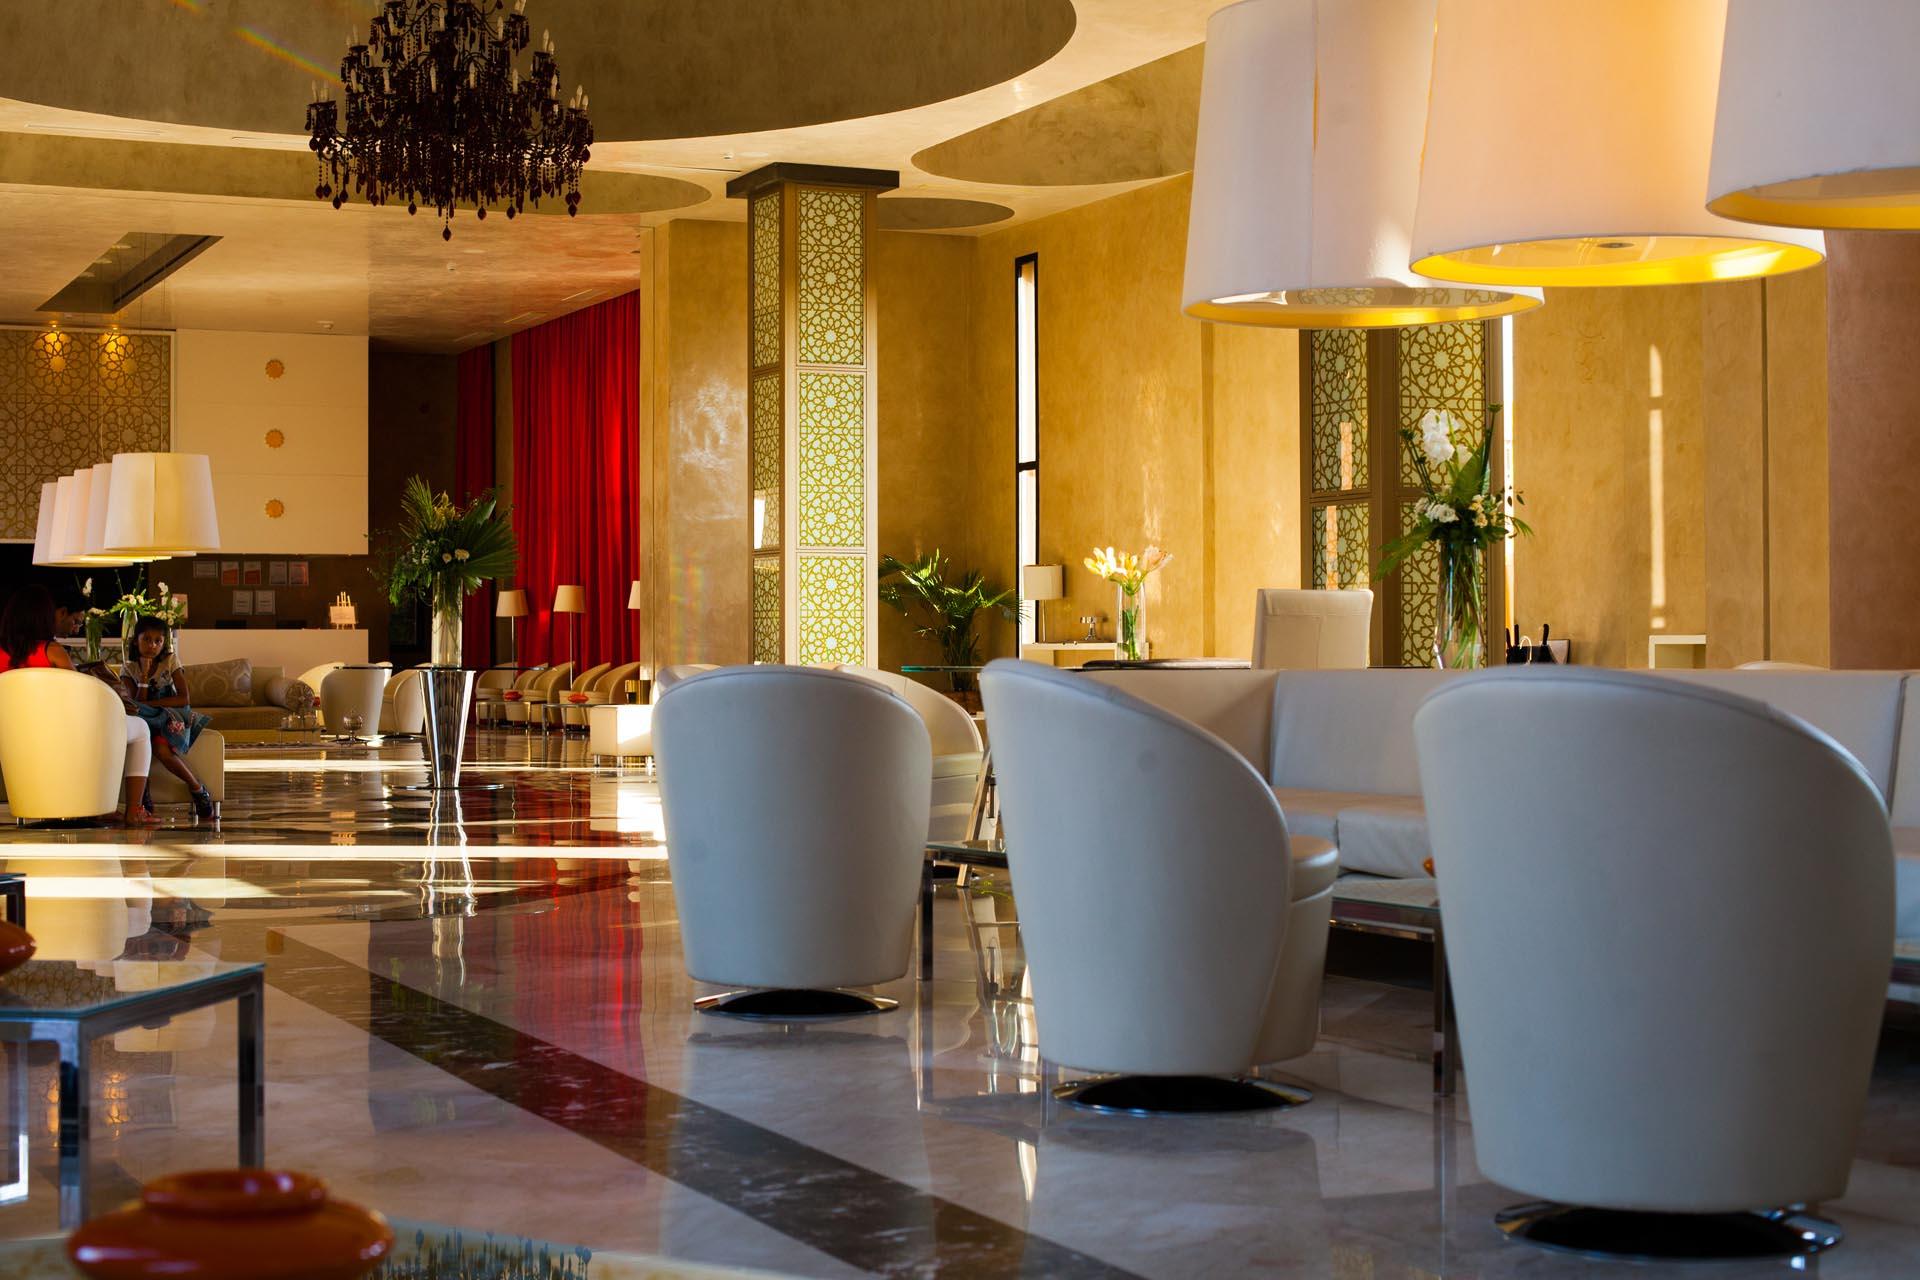 Lobby at Kenzi Club Agdal Medina Hotel in Marrakesh, Morocco